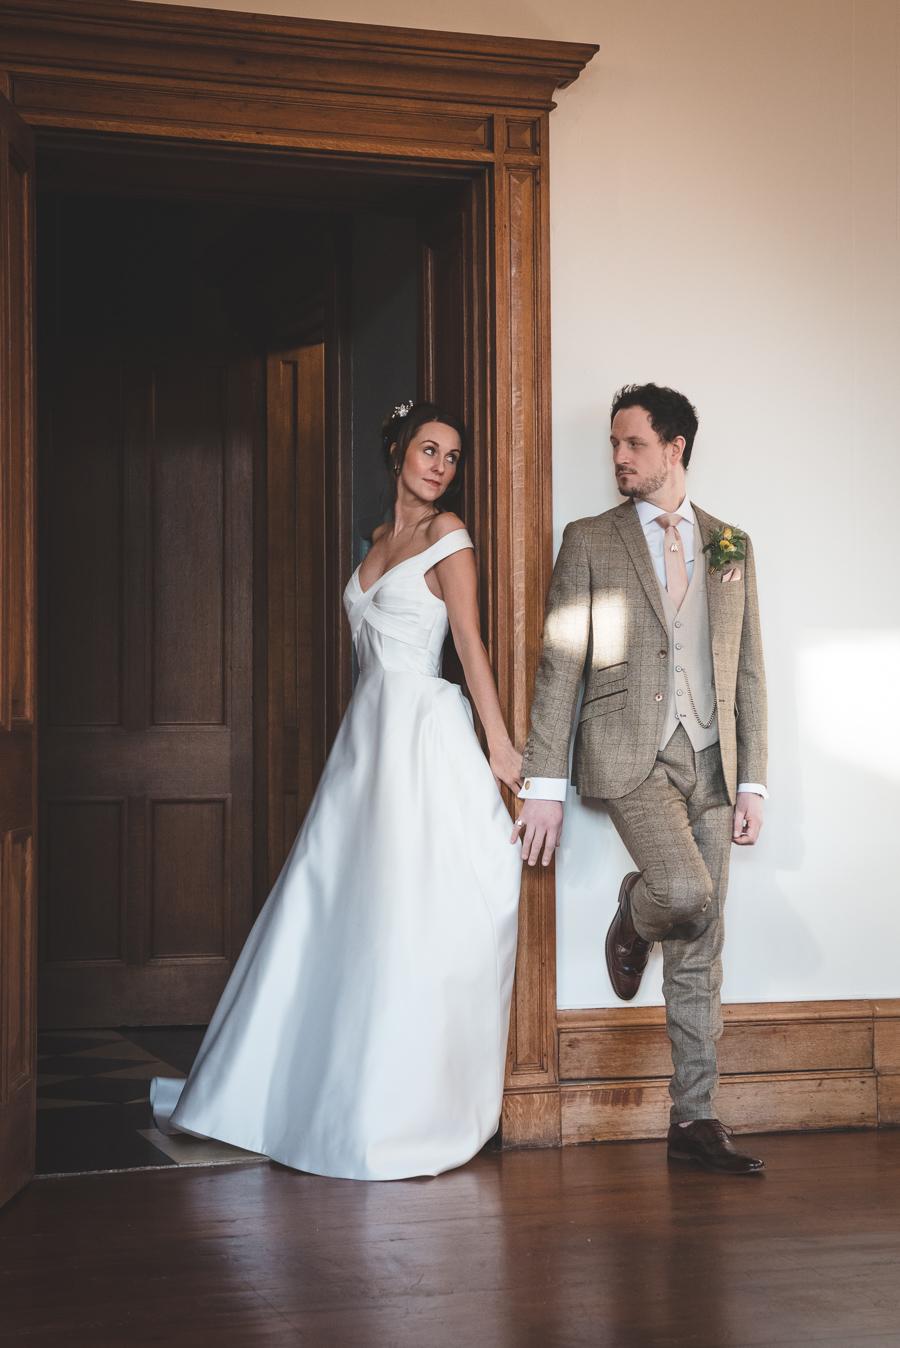 Yorkshire wedding venue styling ideas, photo credit Boho Chic Weddings (19)